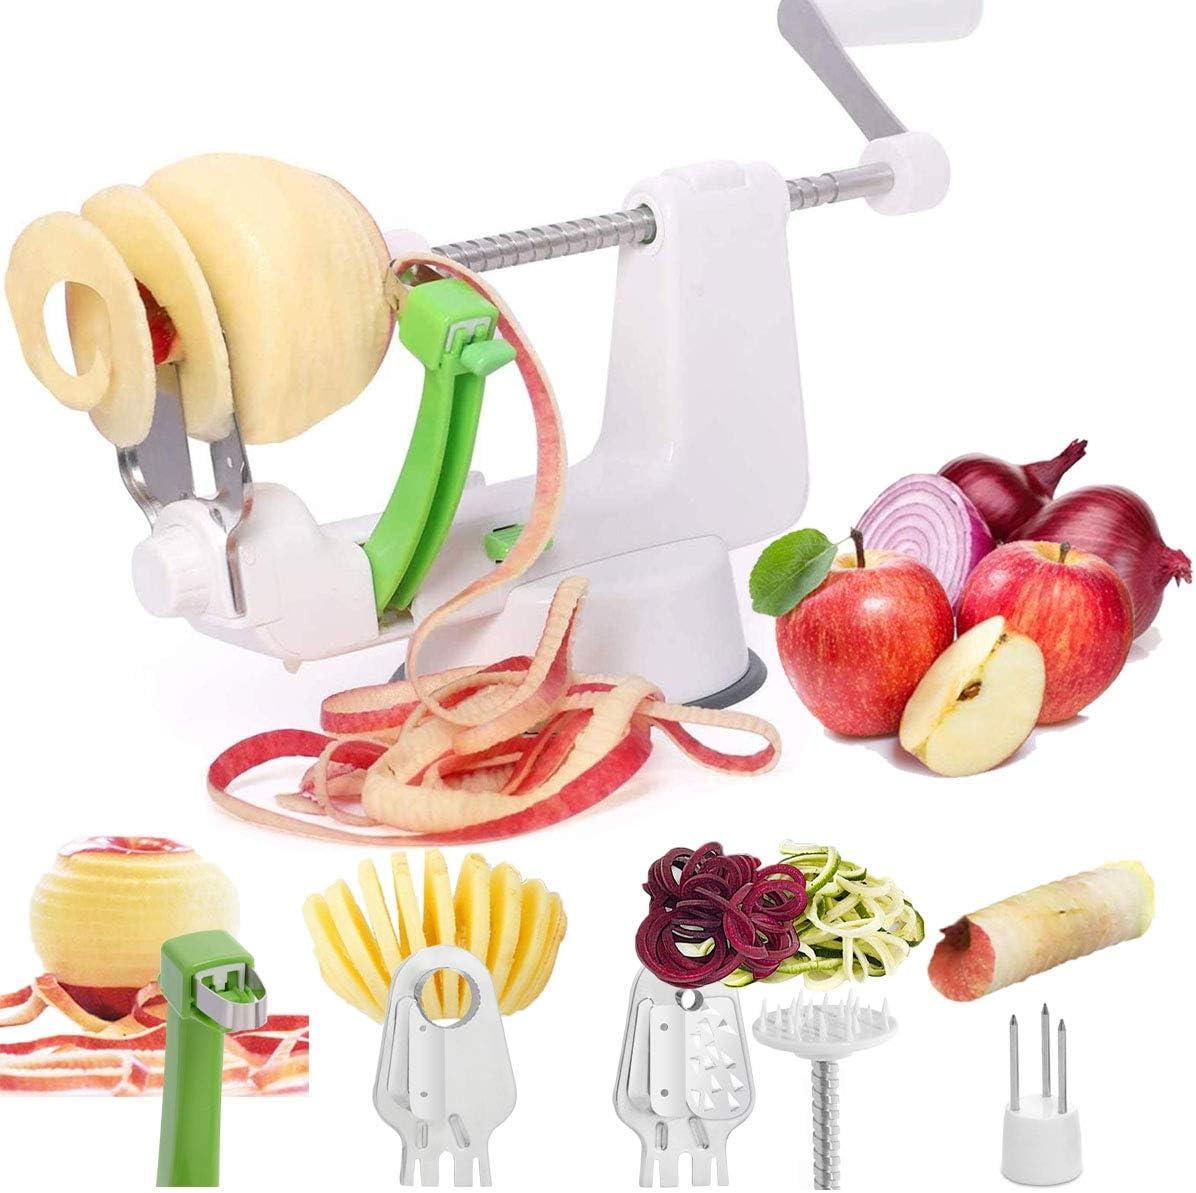 LHS Apple Peeler & Vegetable Spiralizer, Vegetable Spiral Slicer, 4 in1 Multifunctional Peel, Core and Slice Apple, Other Fruits or Vegetables & Make Spiral Veggie Pasta, Spaghetti